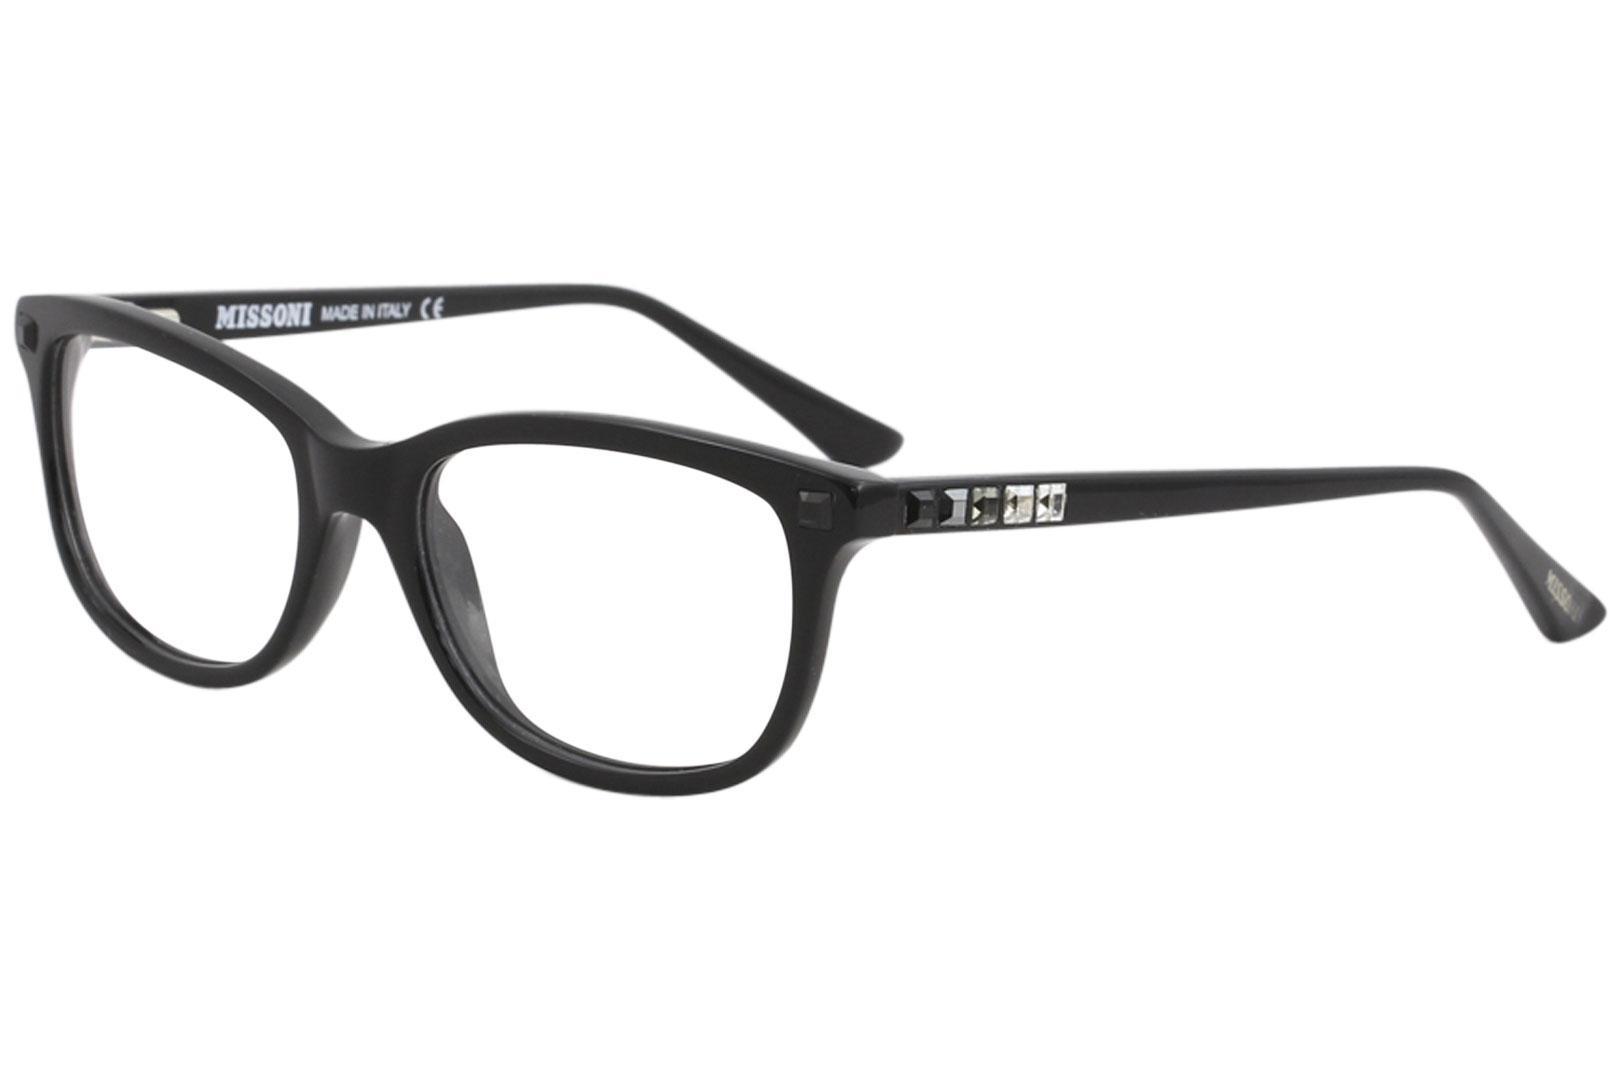 0a5e5ef09228 Missoni Women's Eyeglasses MI283V MI/283/V Full Rim Optical Frame